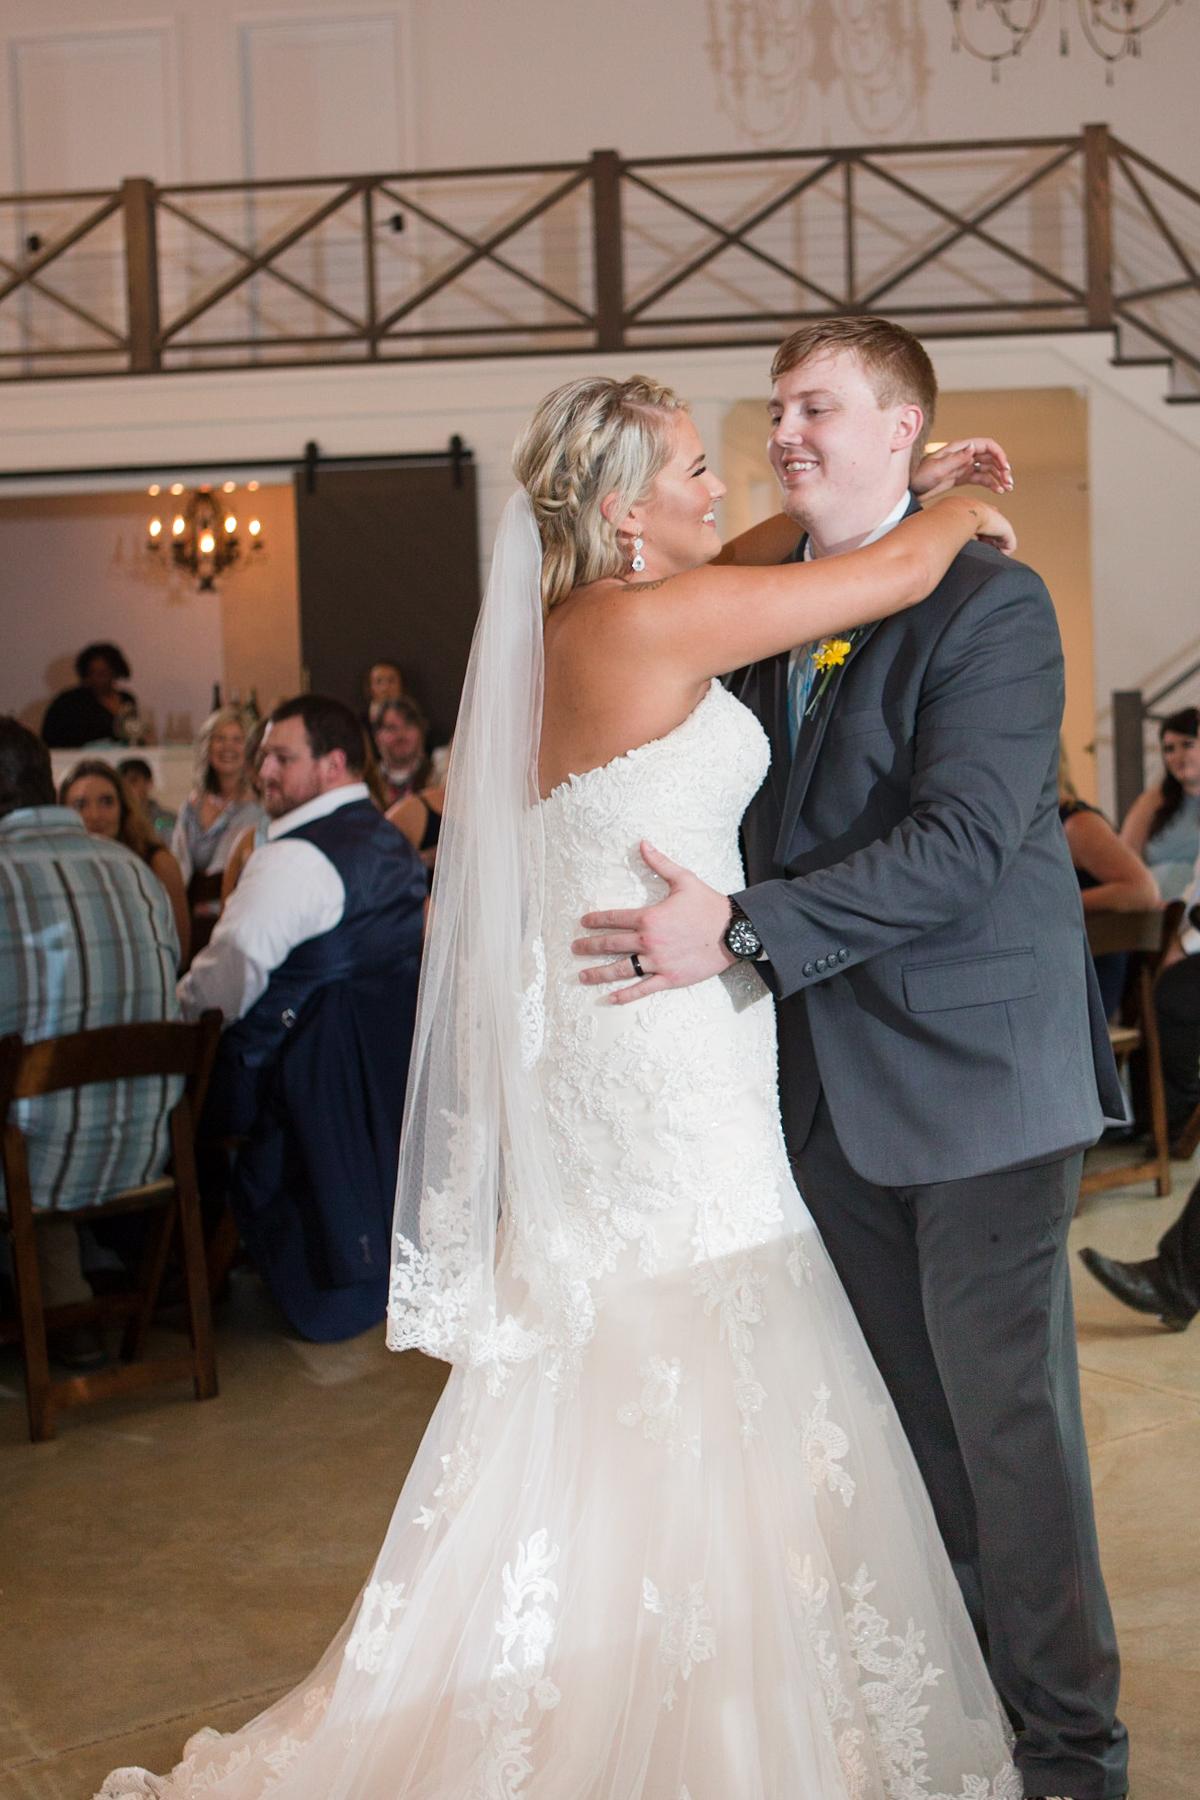 The-venue-at-white-oak-farms-wedding-nashville-wedding-photographers-0235.jpg